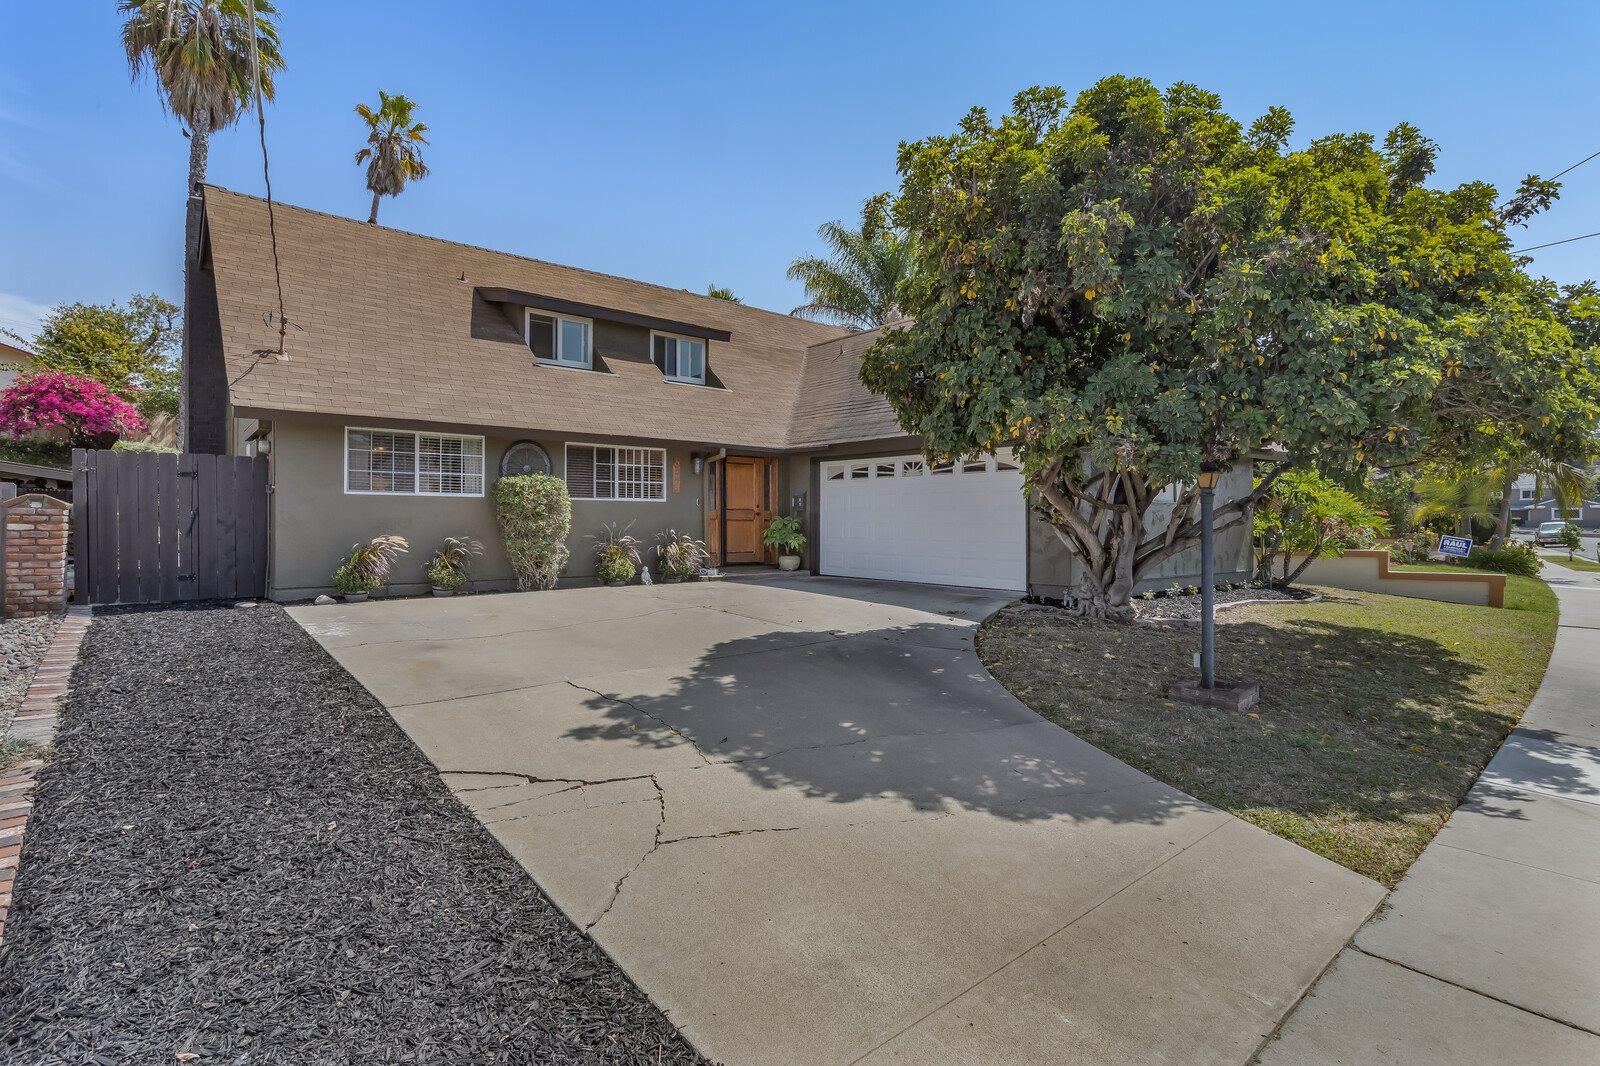 6245 Crystal Lake, San Diego, CA 92119